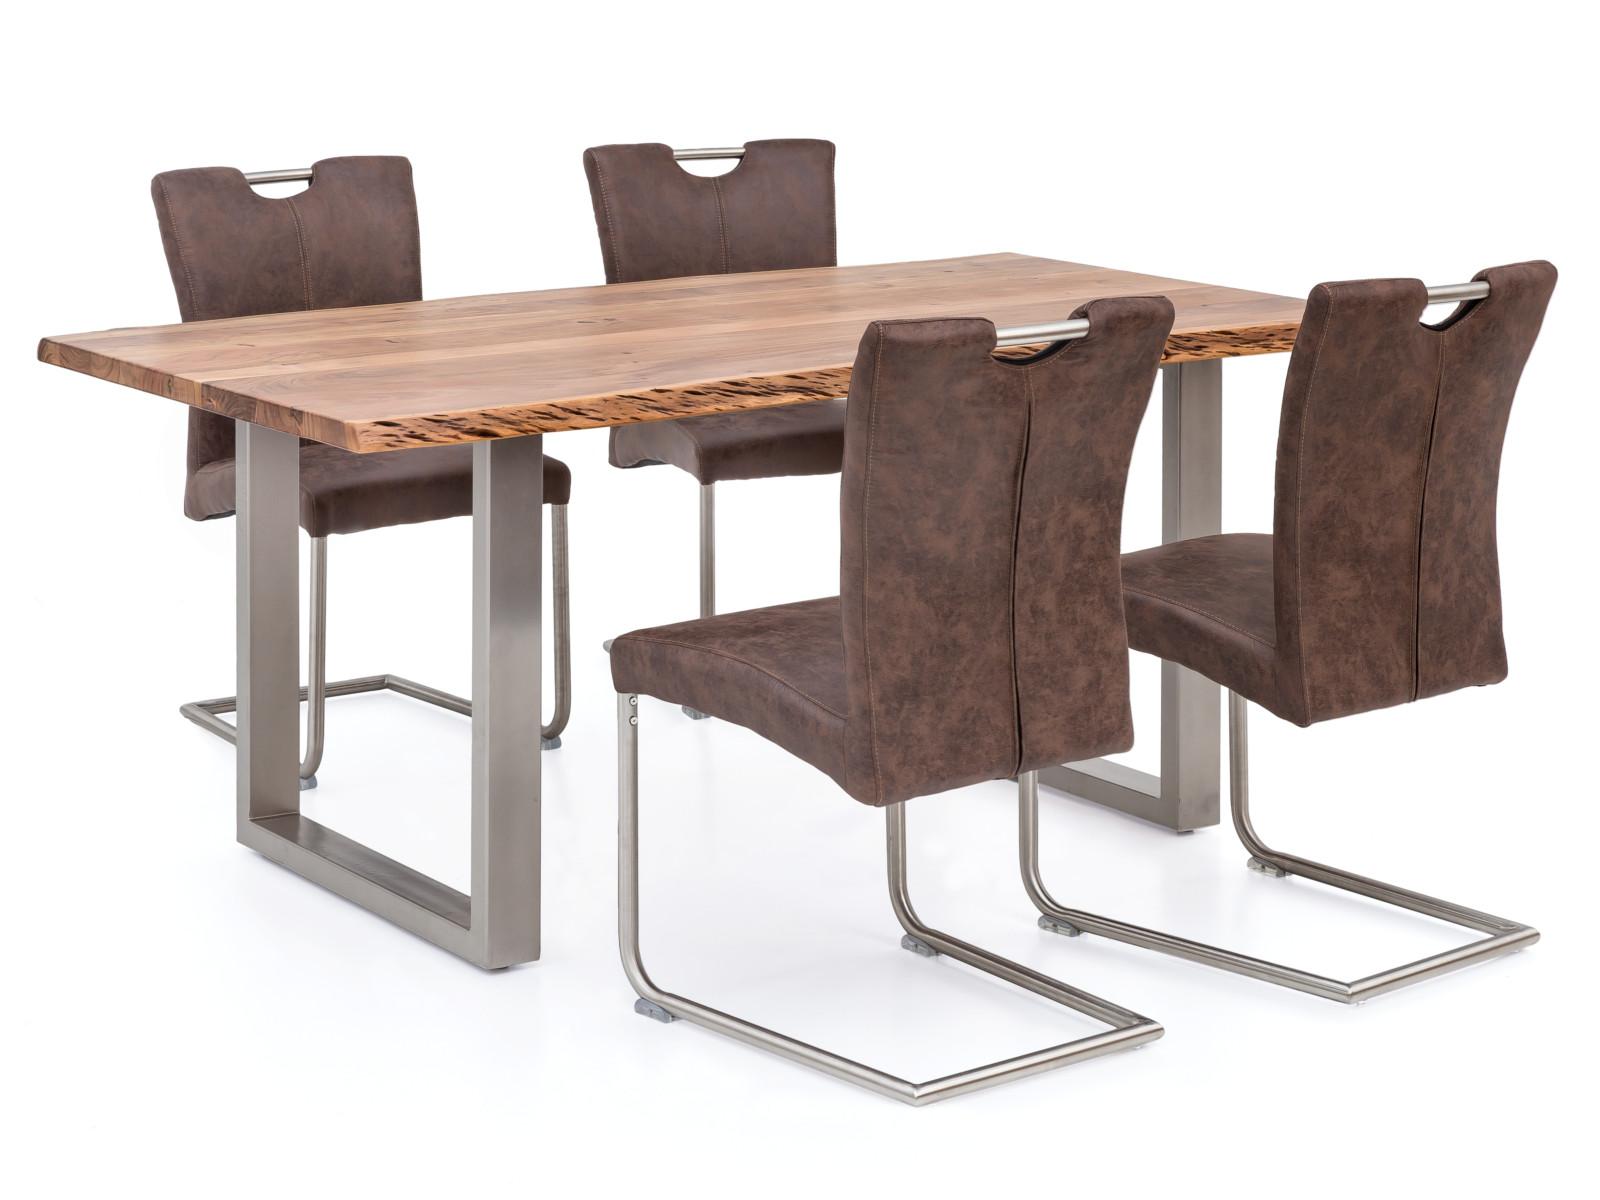 tischgruppe reefton metall edelstahloptik woodkings shop. Black Bedroom Furniture Sets. Home Design Ideas